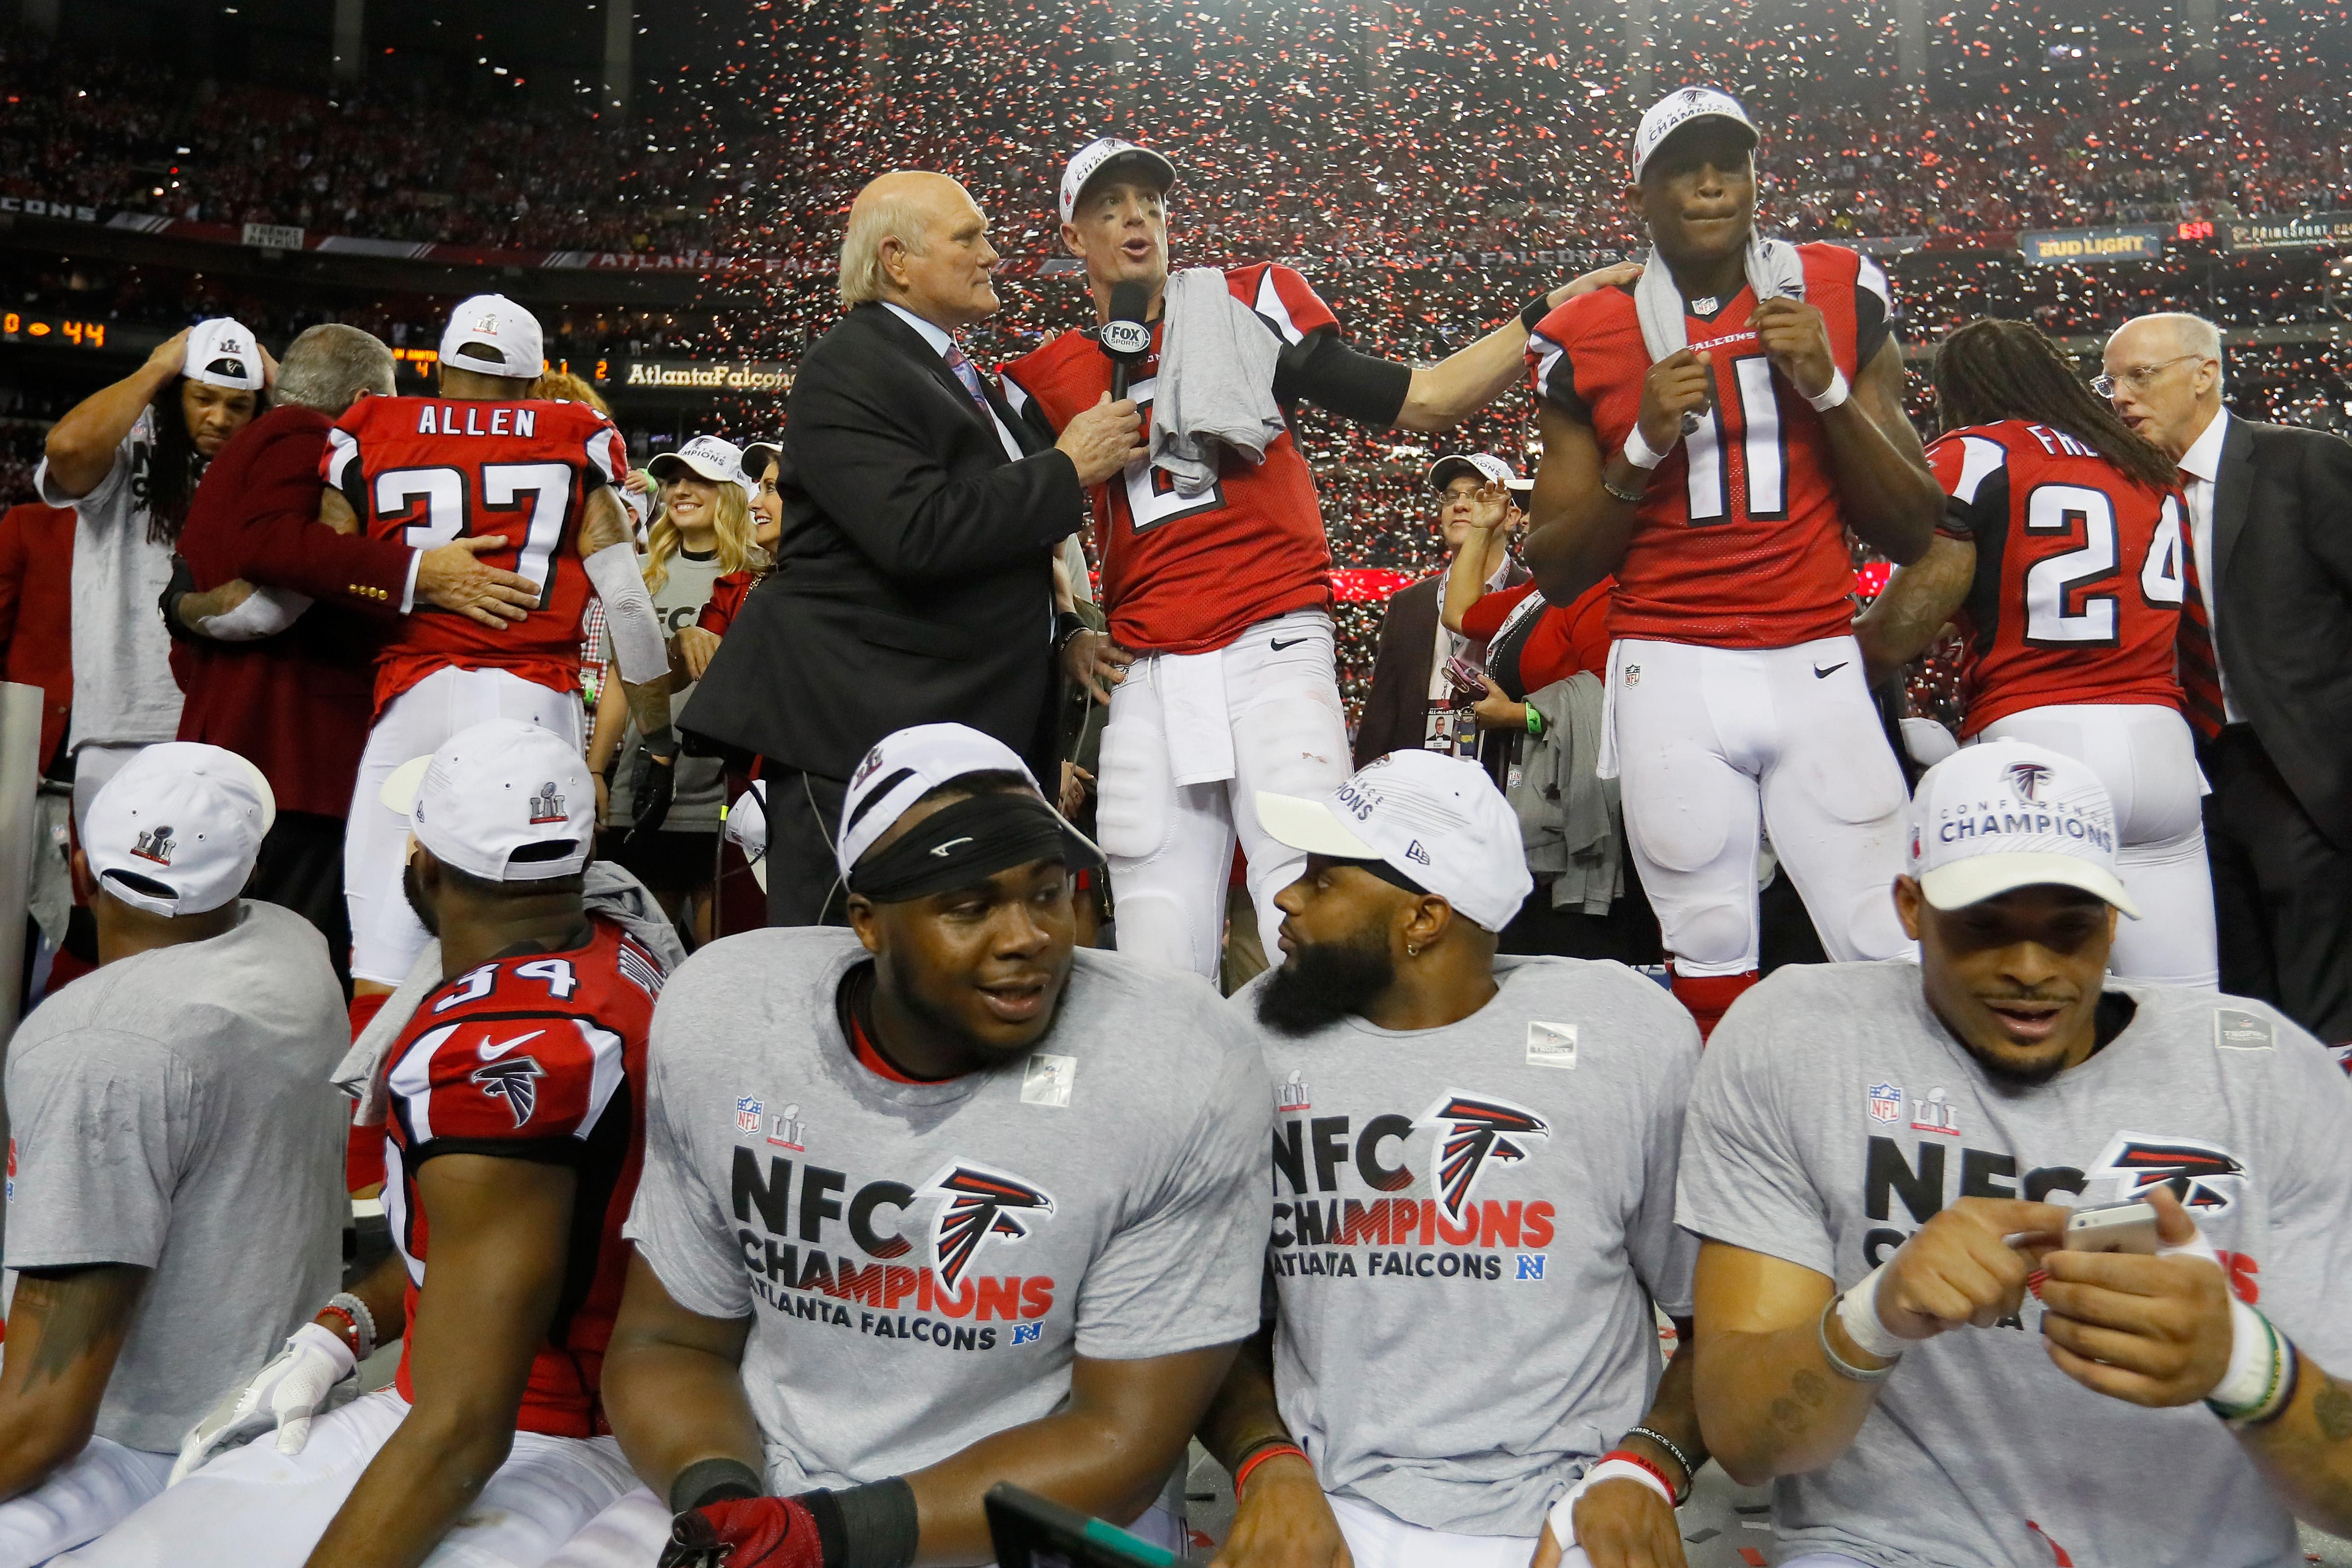 NFC Championship - Green Bay Packers v Atlanta Falcons